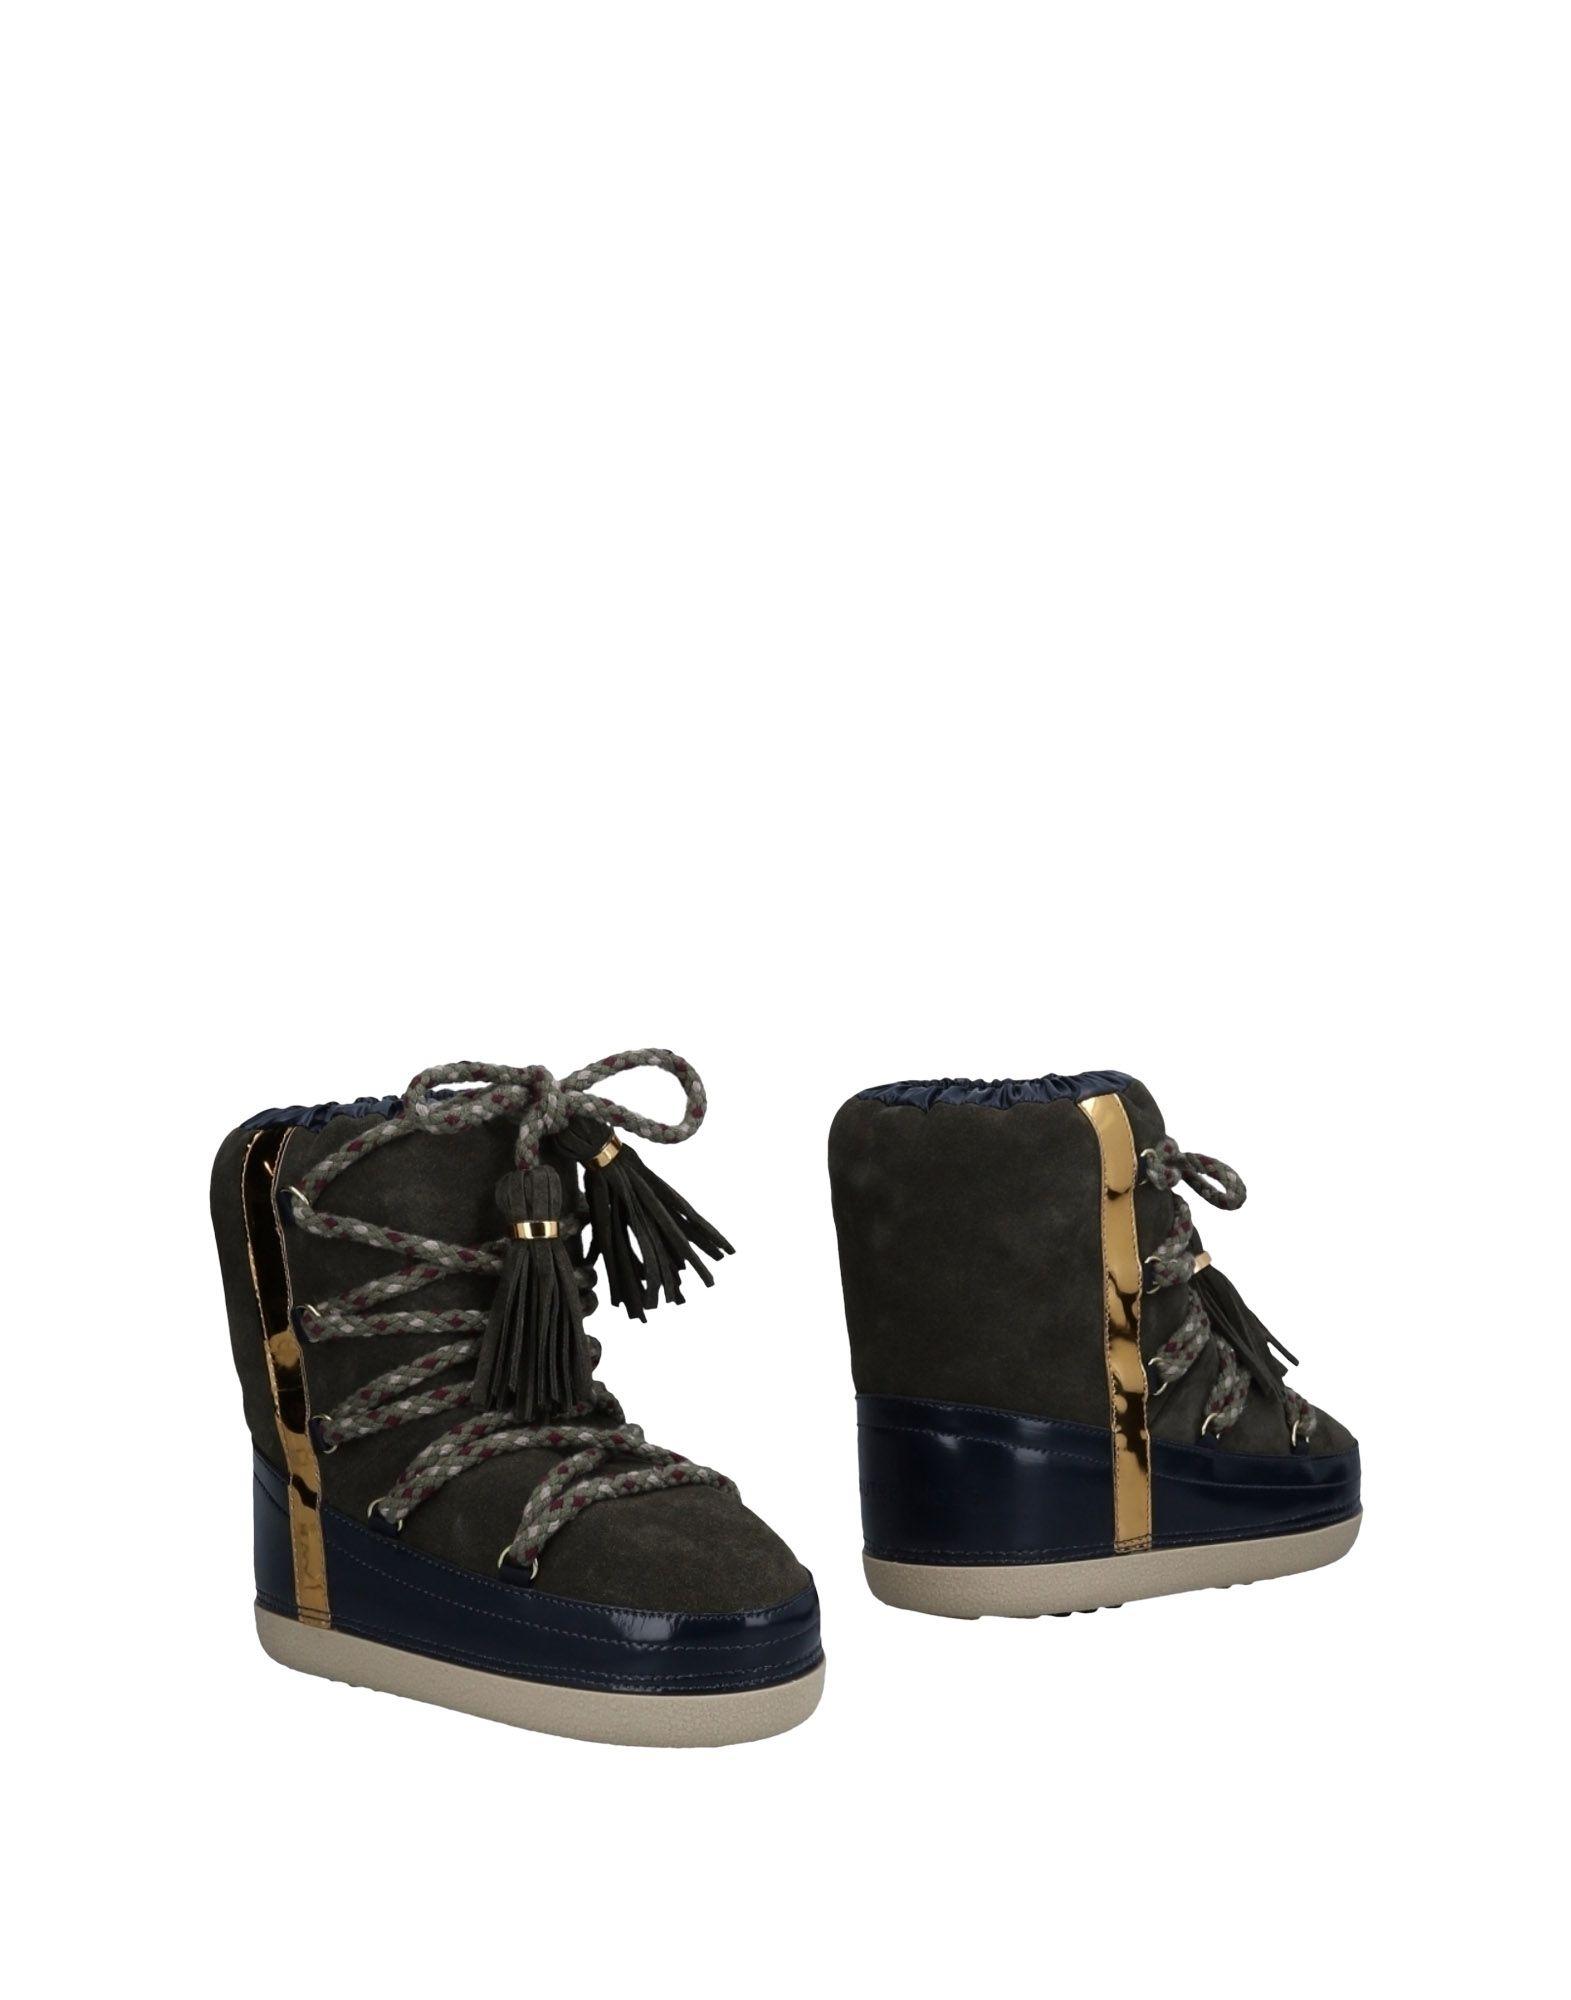 L' Autre Chose Stiefelette Damen Schuhe  11248059RDGut aussehende strapazierfähige Schuhe Damen 2646db